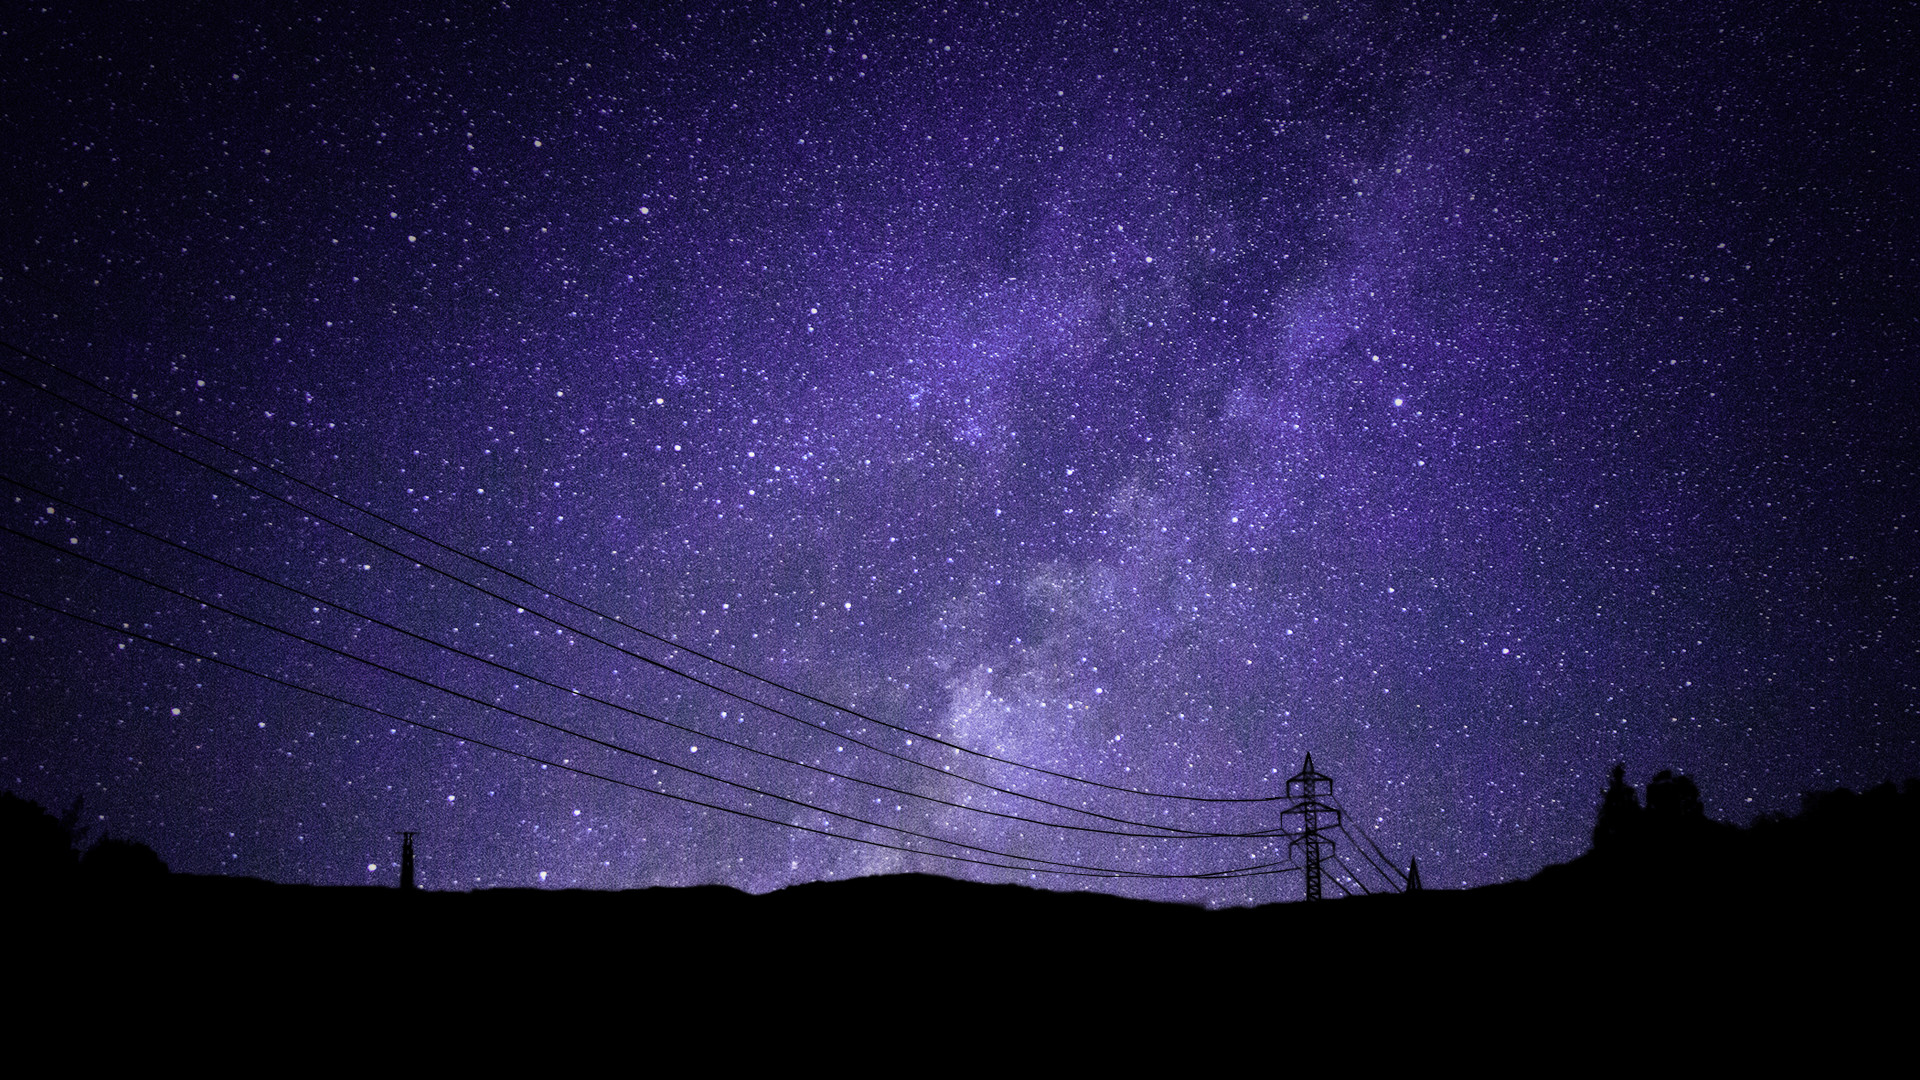 Res: 1920x1080, PlusPng.com galaxy-stars-wallpaper-hd PlusPng.com - Purple .